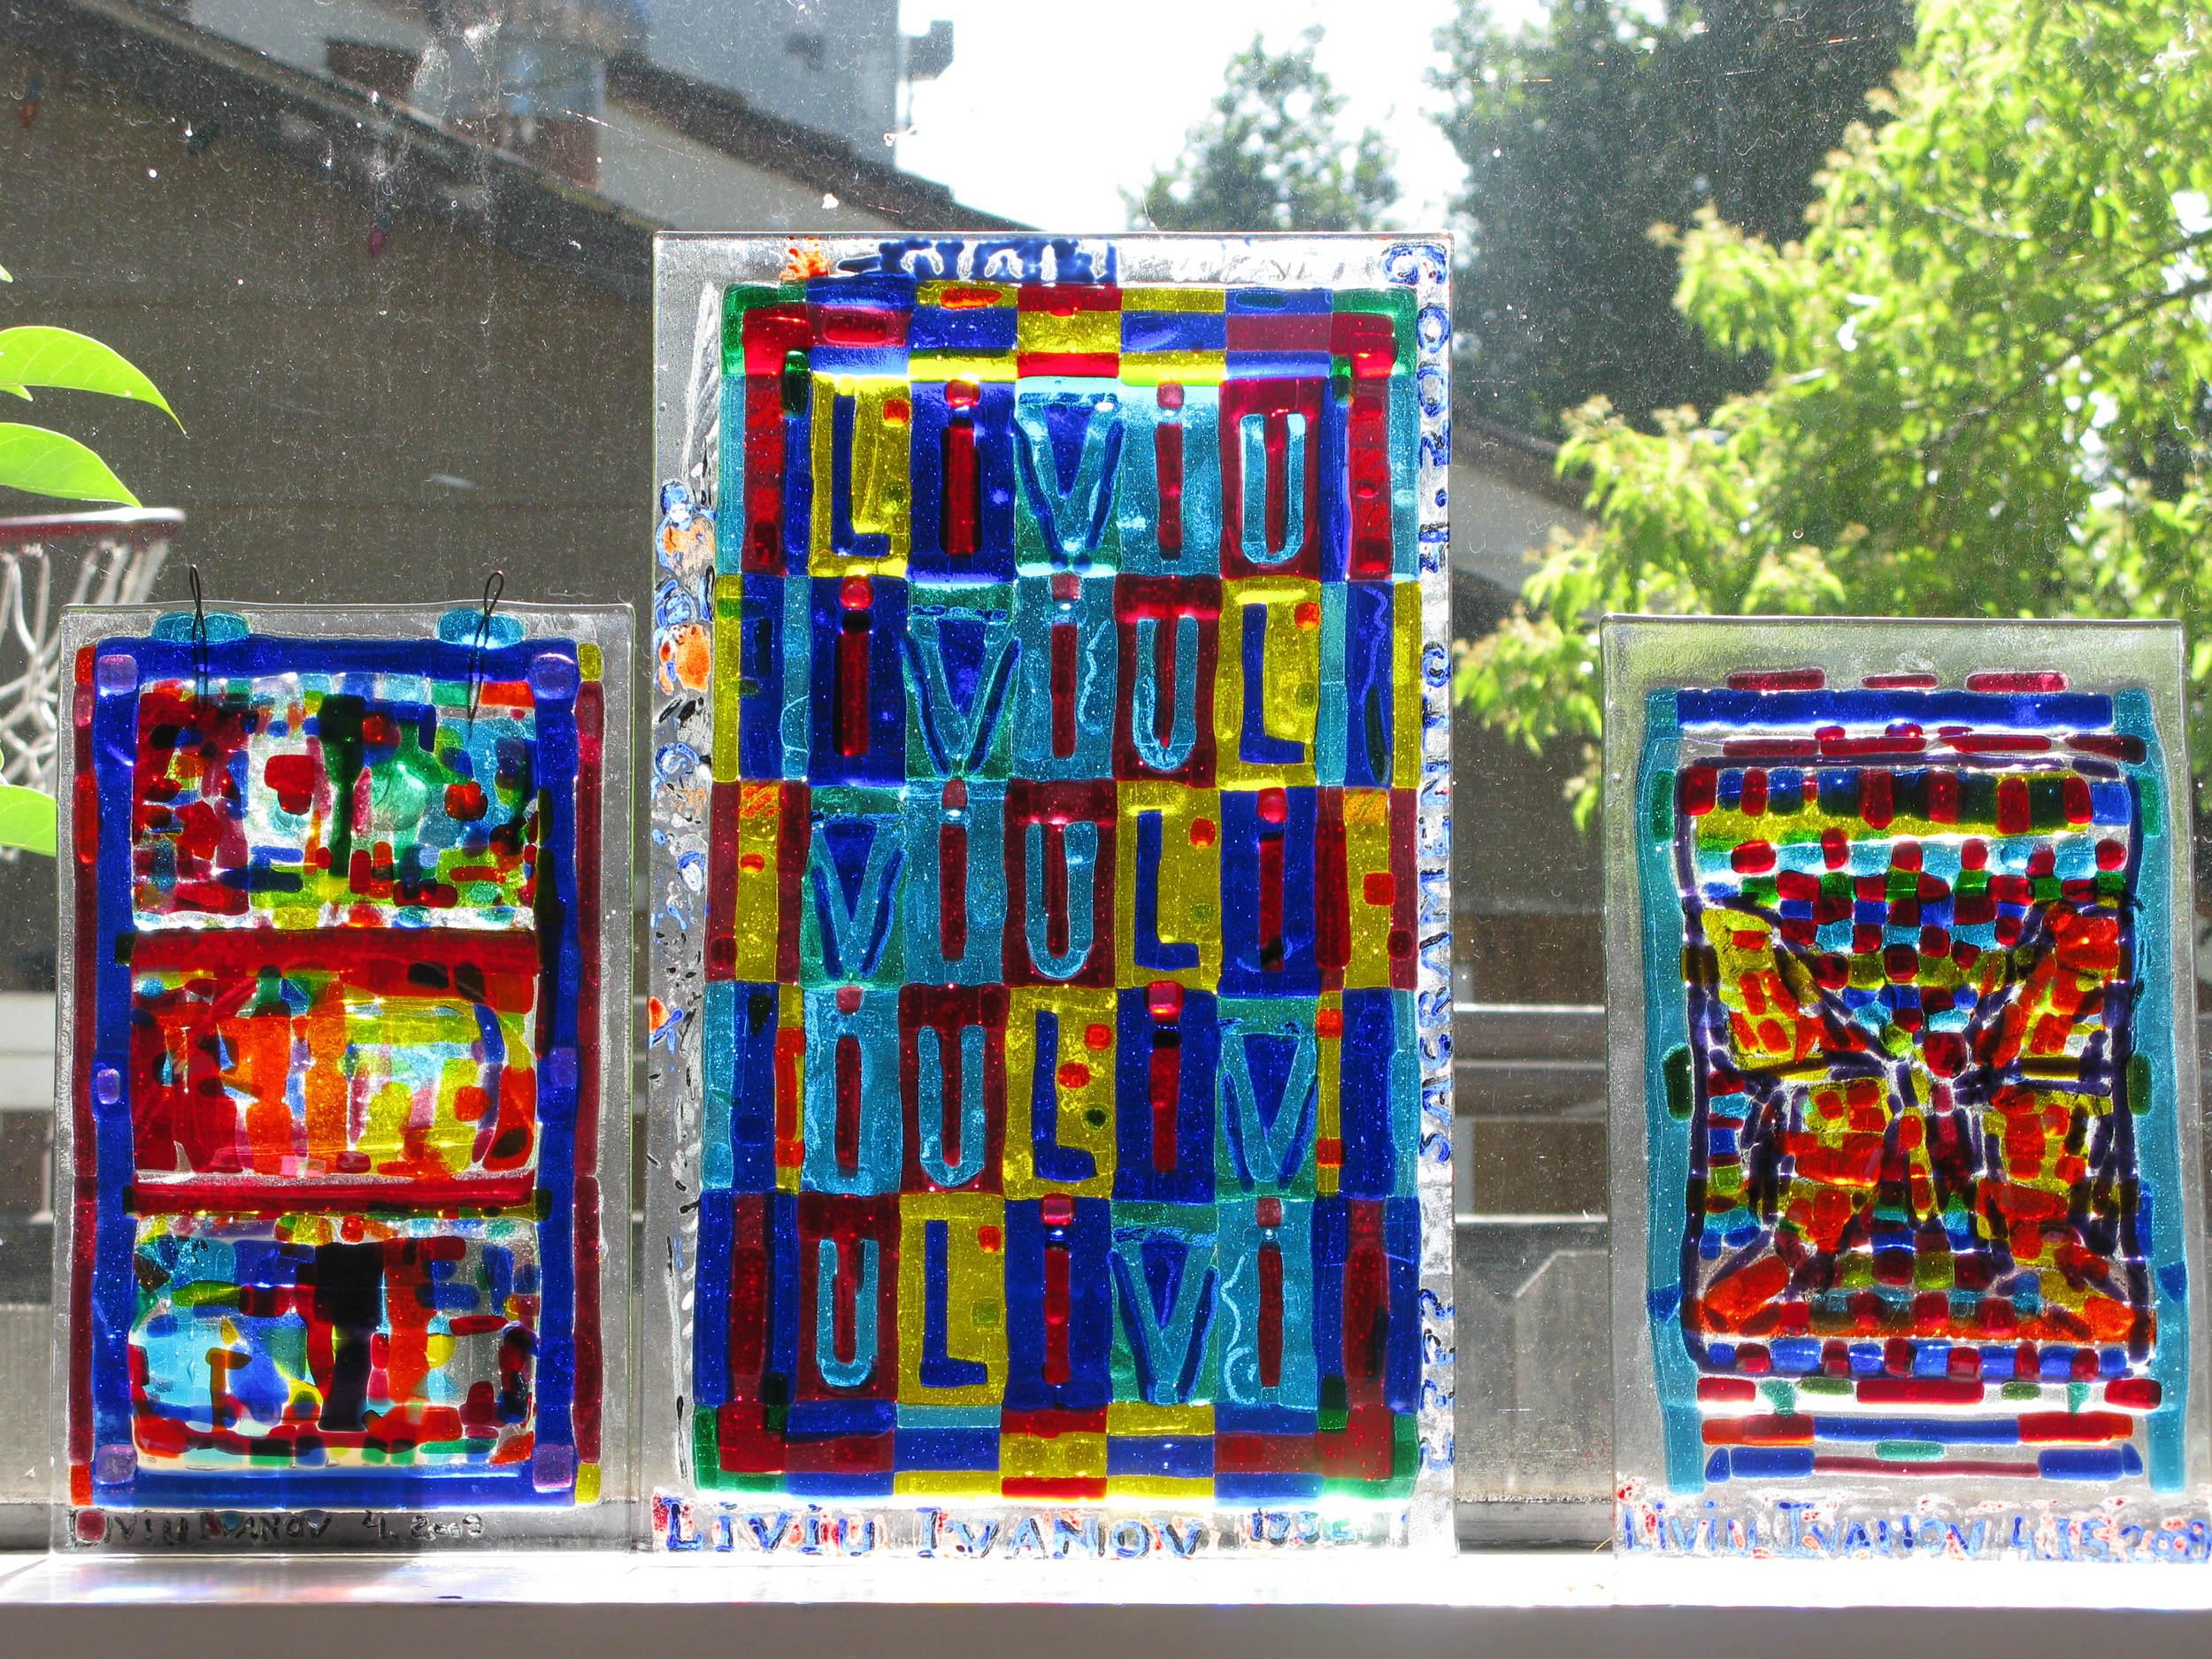 Three_piecesIMG_6180 5-9-2009 8-15-19 AM.JPG